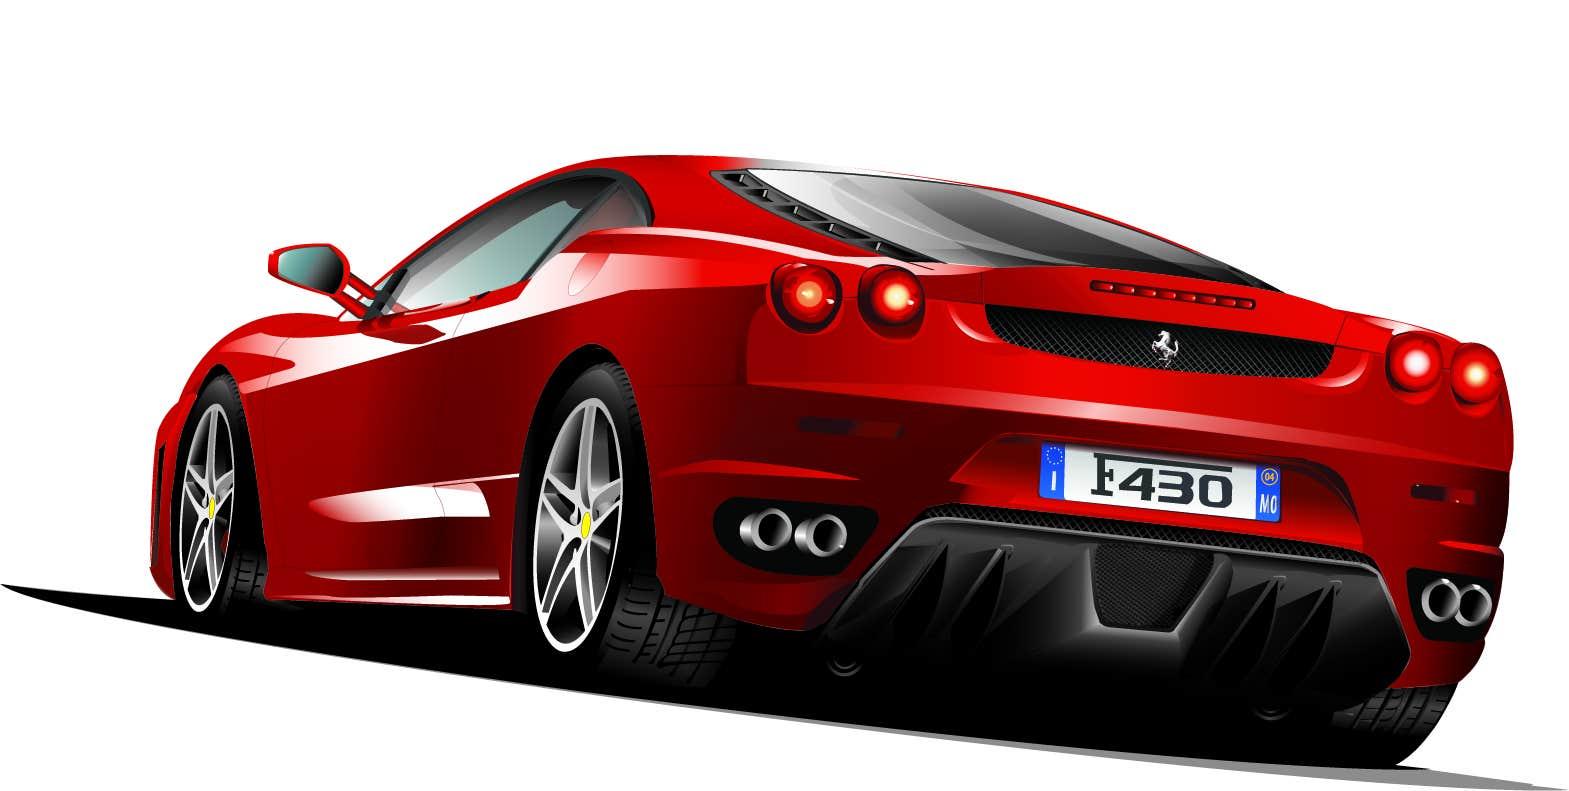 Car Design by Syed Muhammad in Adobe Illustrator CS3